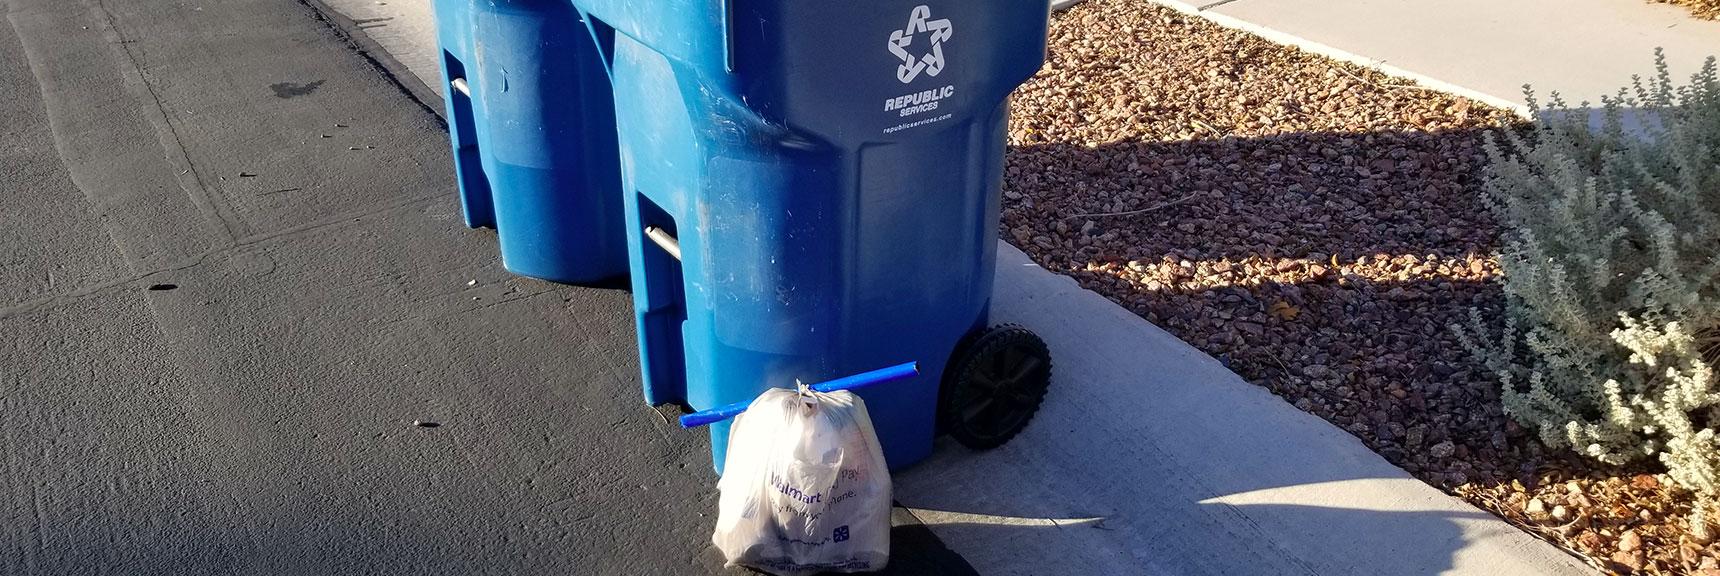 Environmental Consciousness in Las Vegas, Nevada, Slide 001